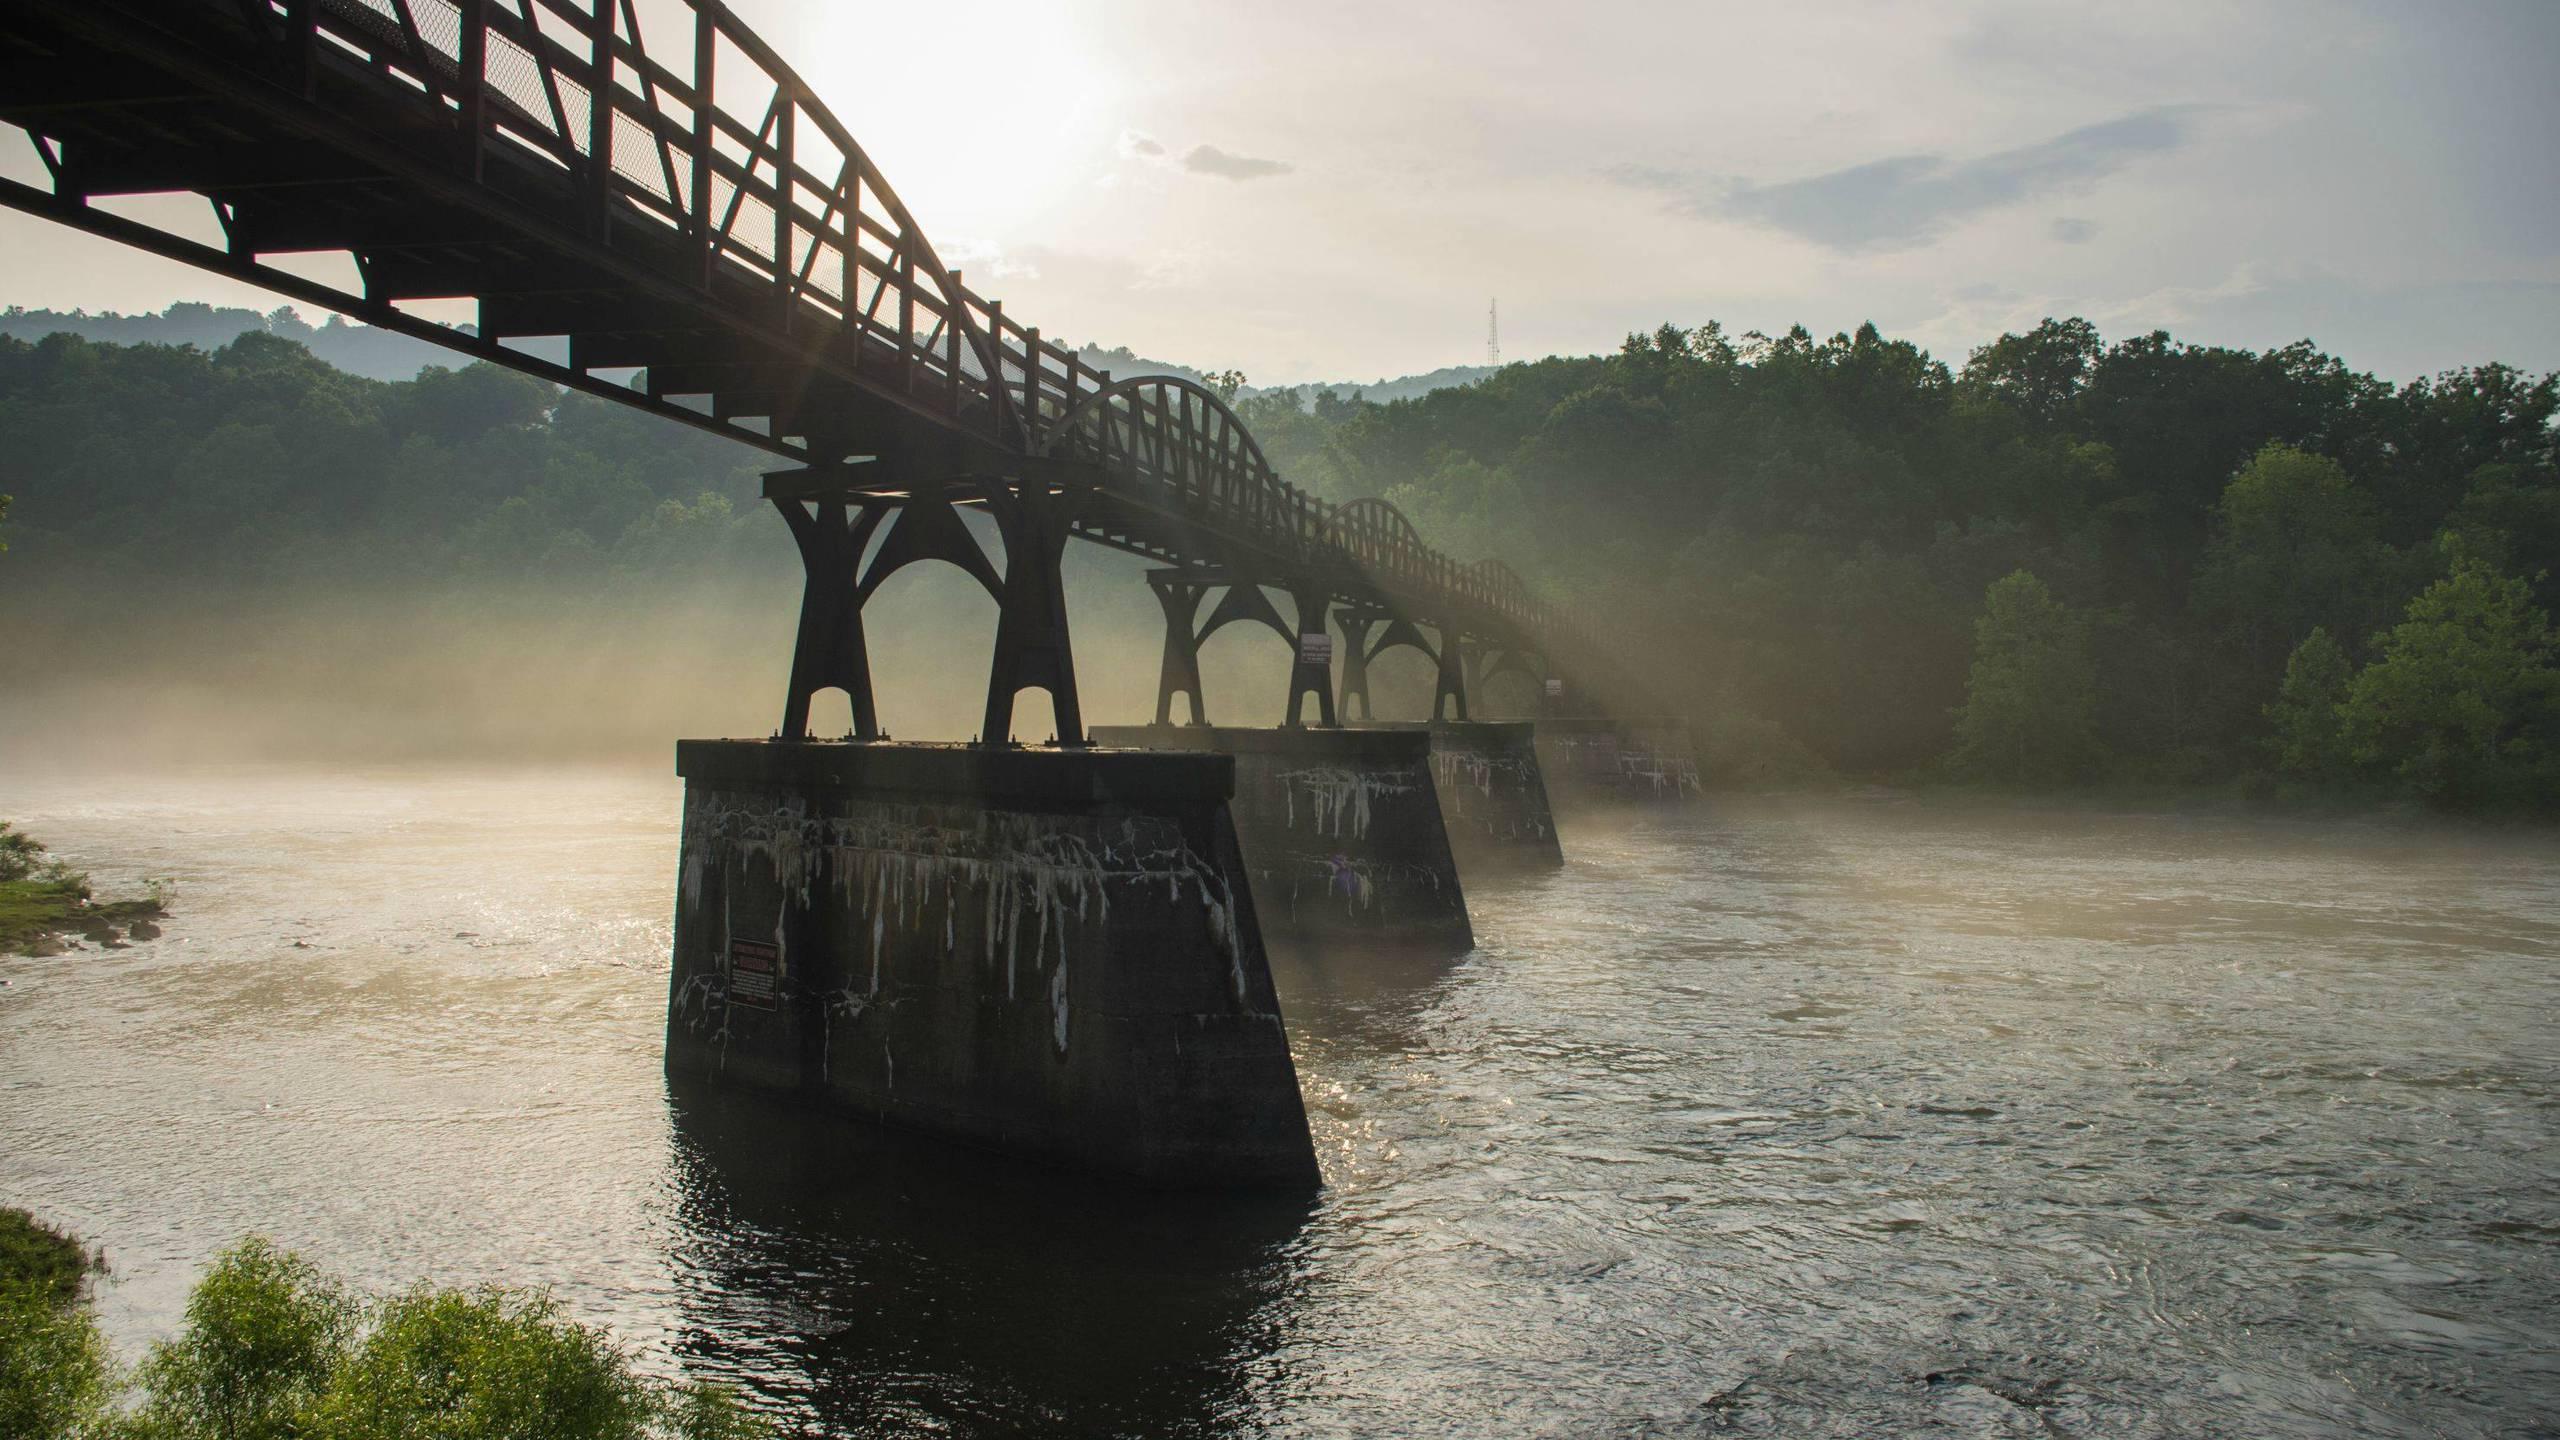 BOTPOST [BOTPOST] Bridge in the Mist f8 1500 ISO 160 iimgur 2560x1440